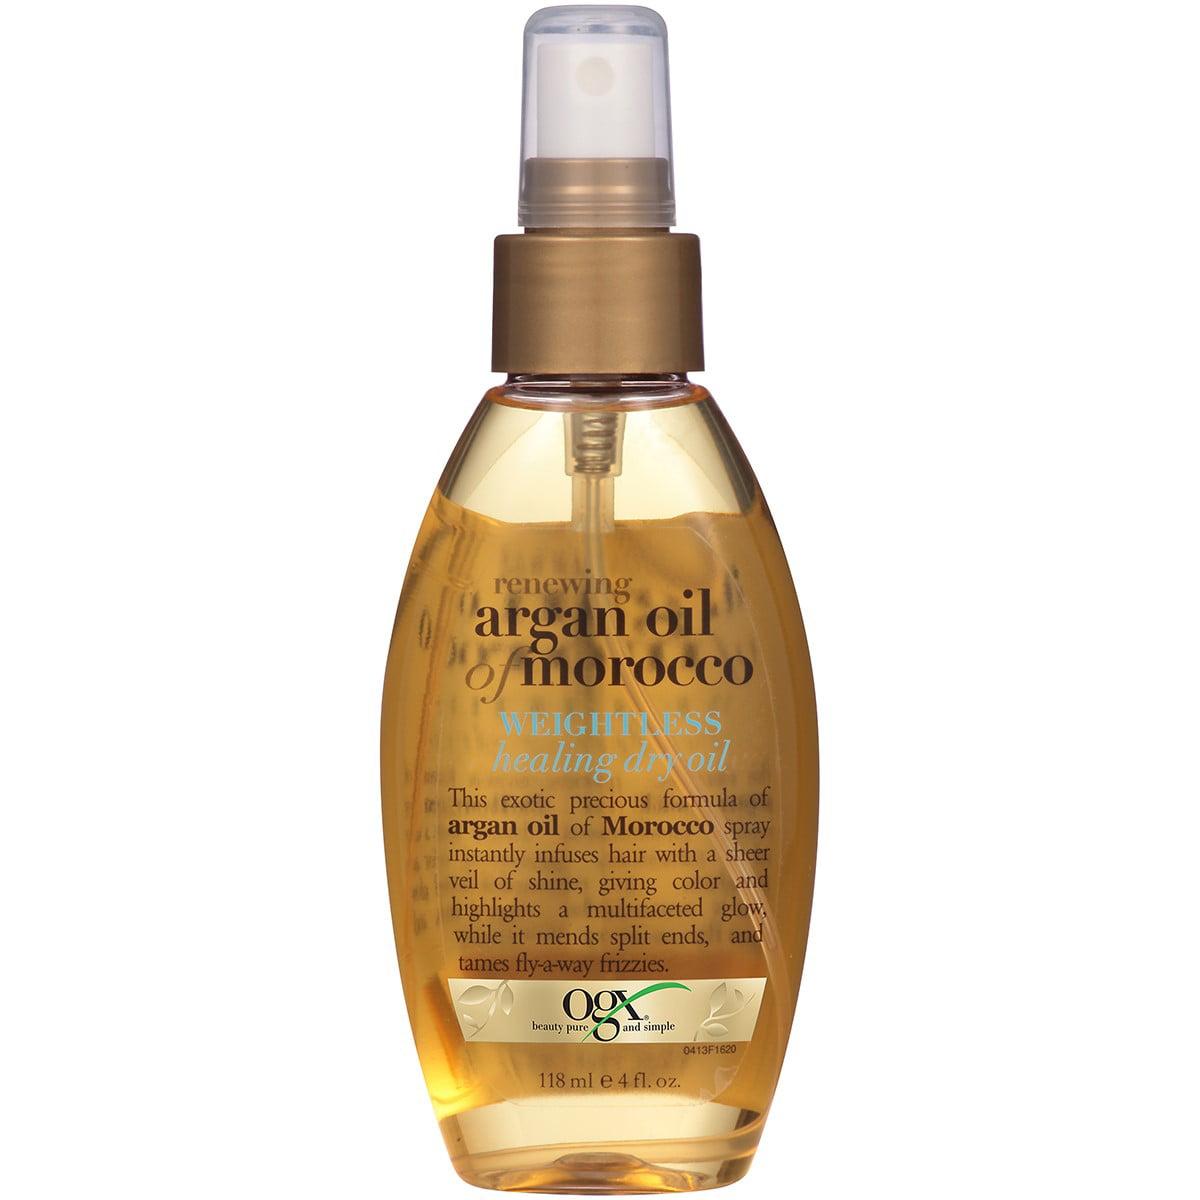 OGX Renewing Argan Oil of Morocco Weightless Healing Dry Oil, 4 Oz